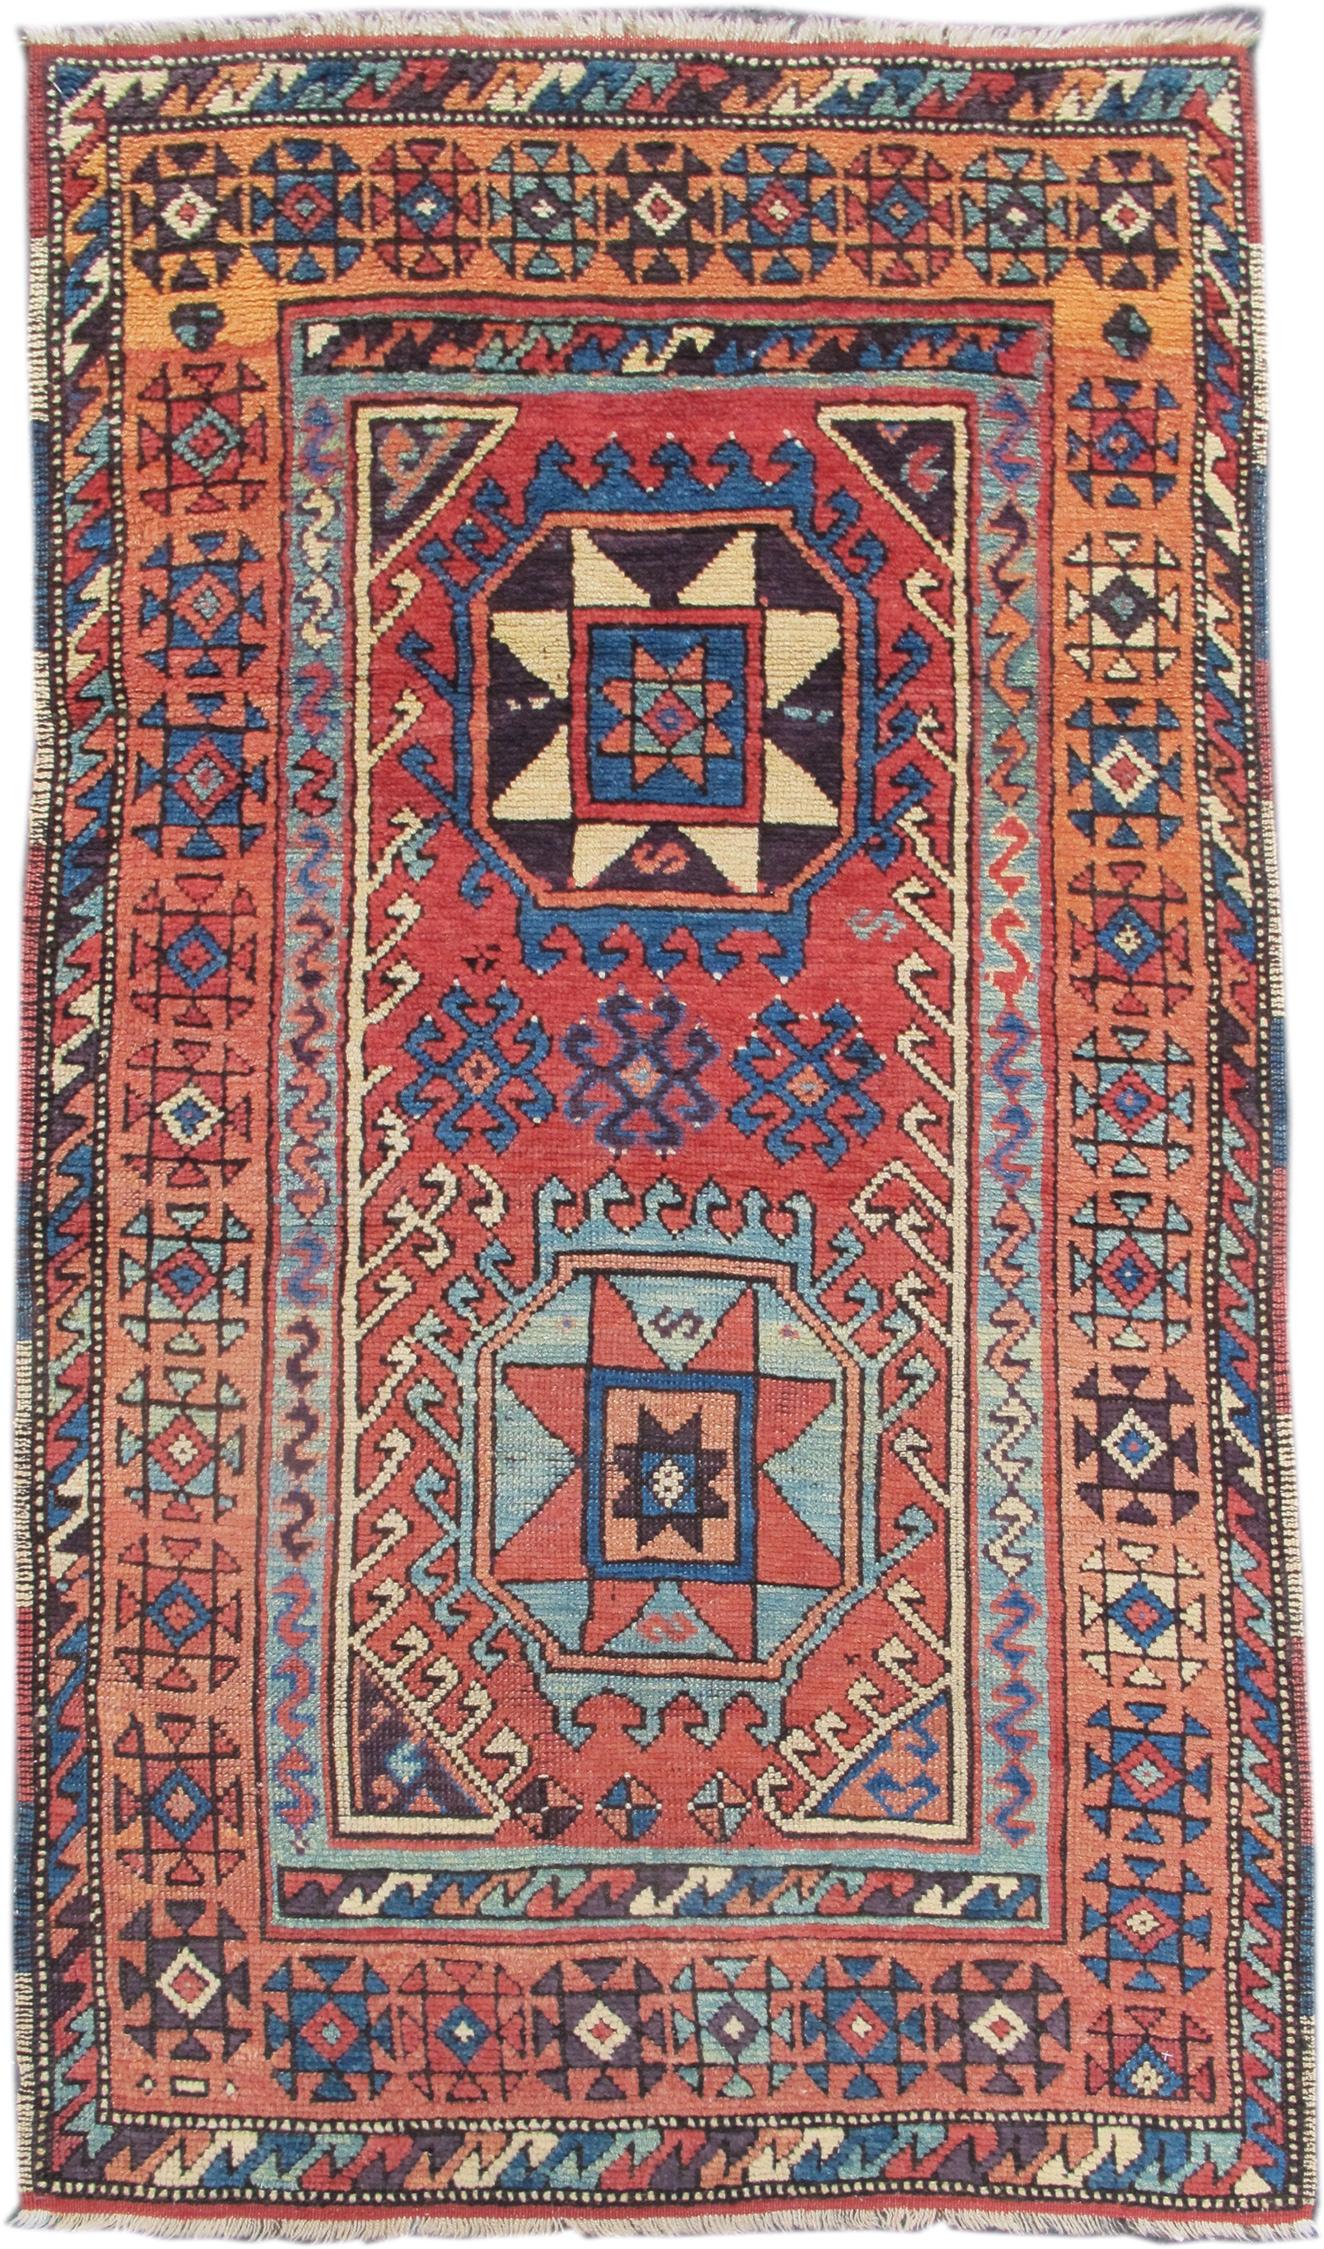 Chumra prayer rug